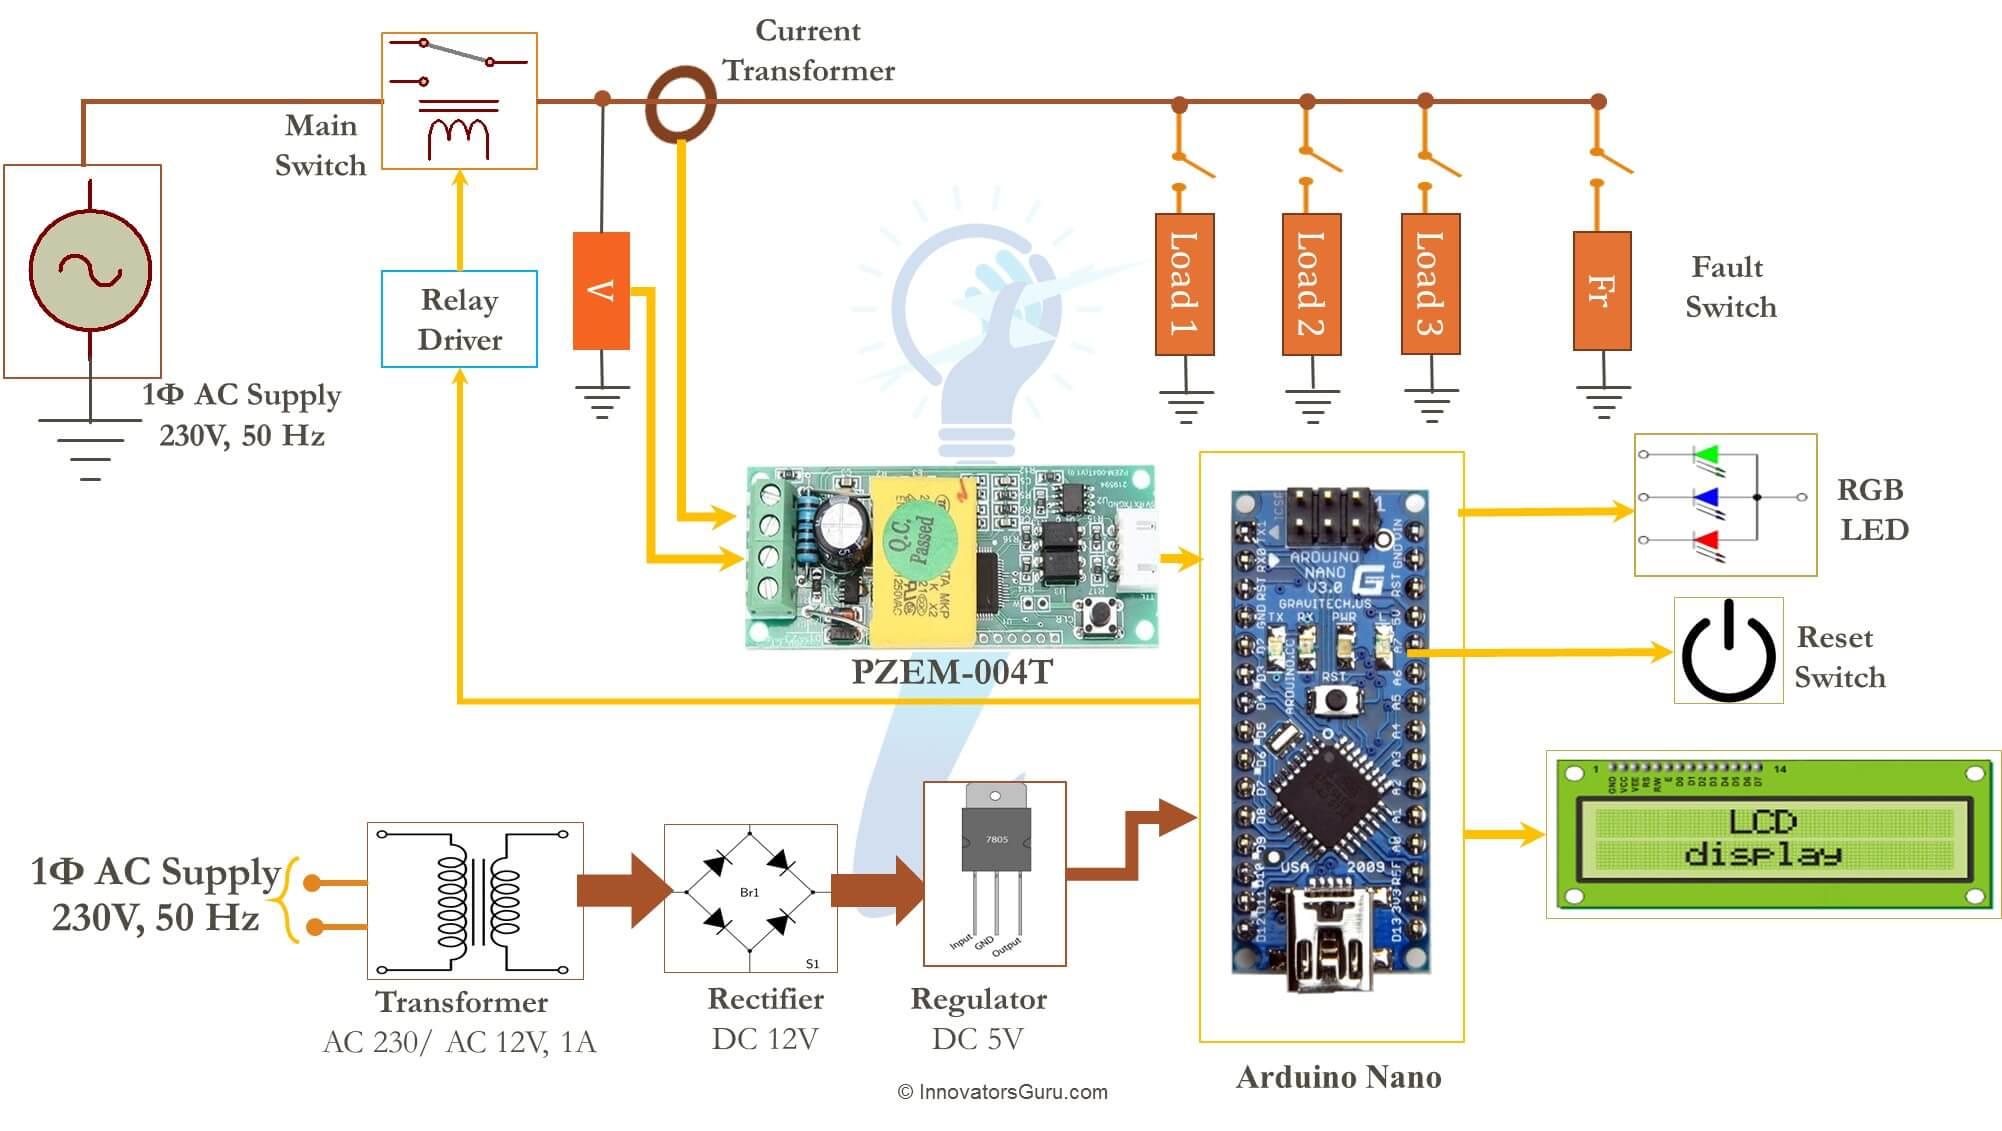 IG001 AC Digital Multi function Smart Meter using Arduino and PZEM-004T